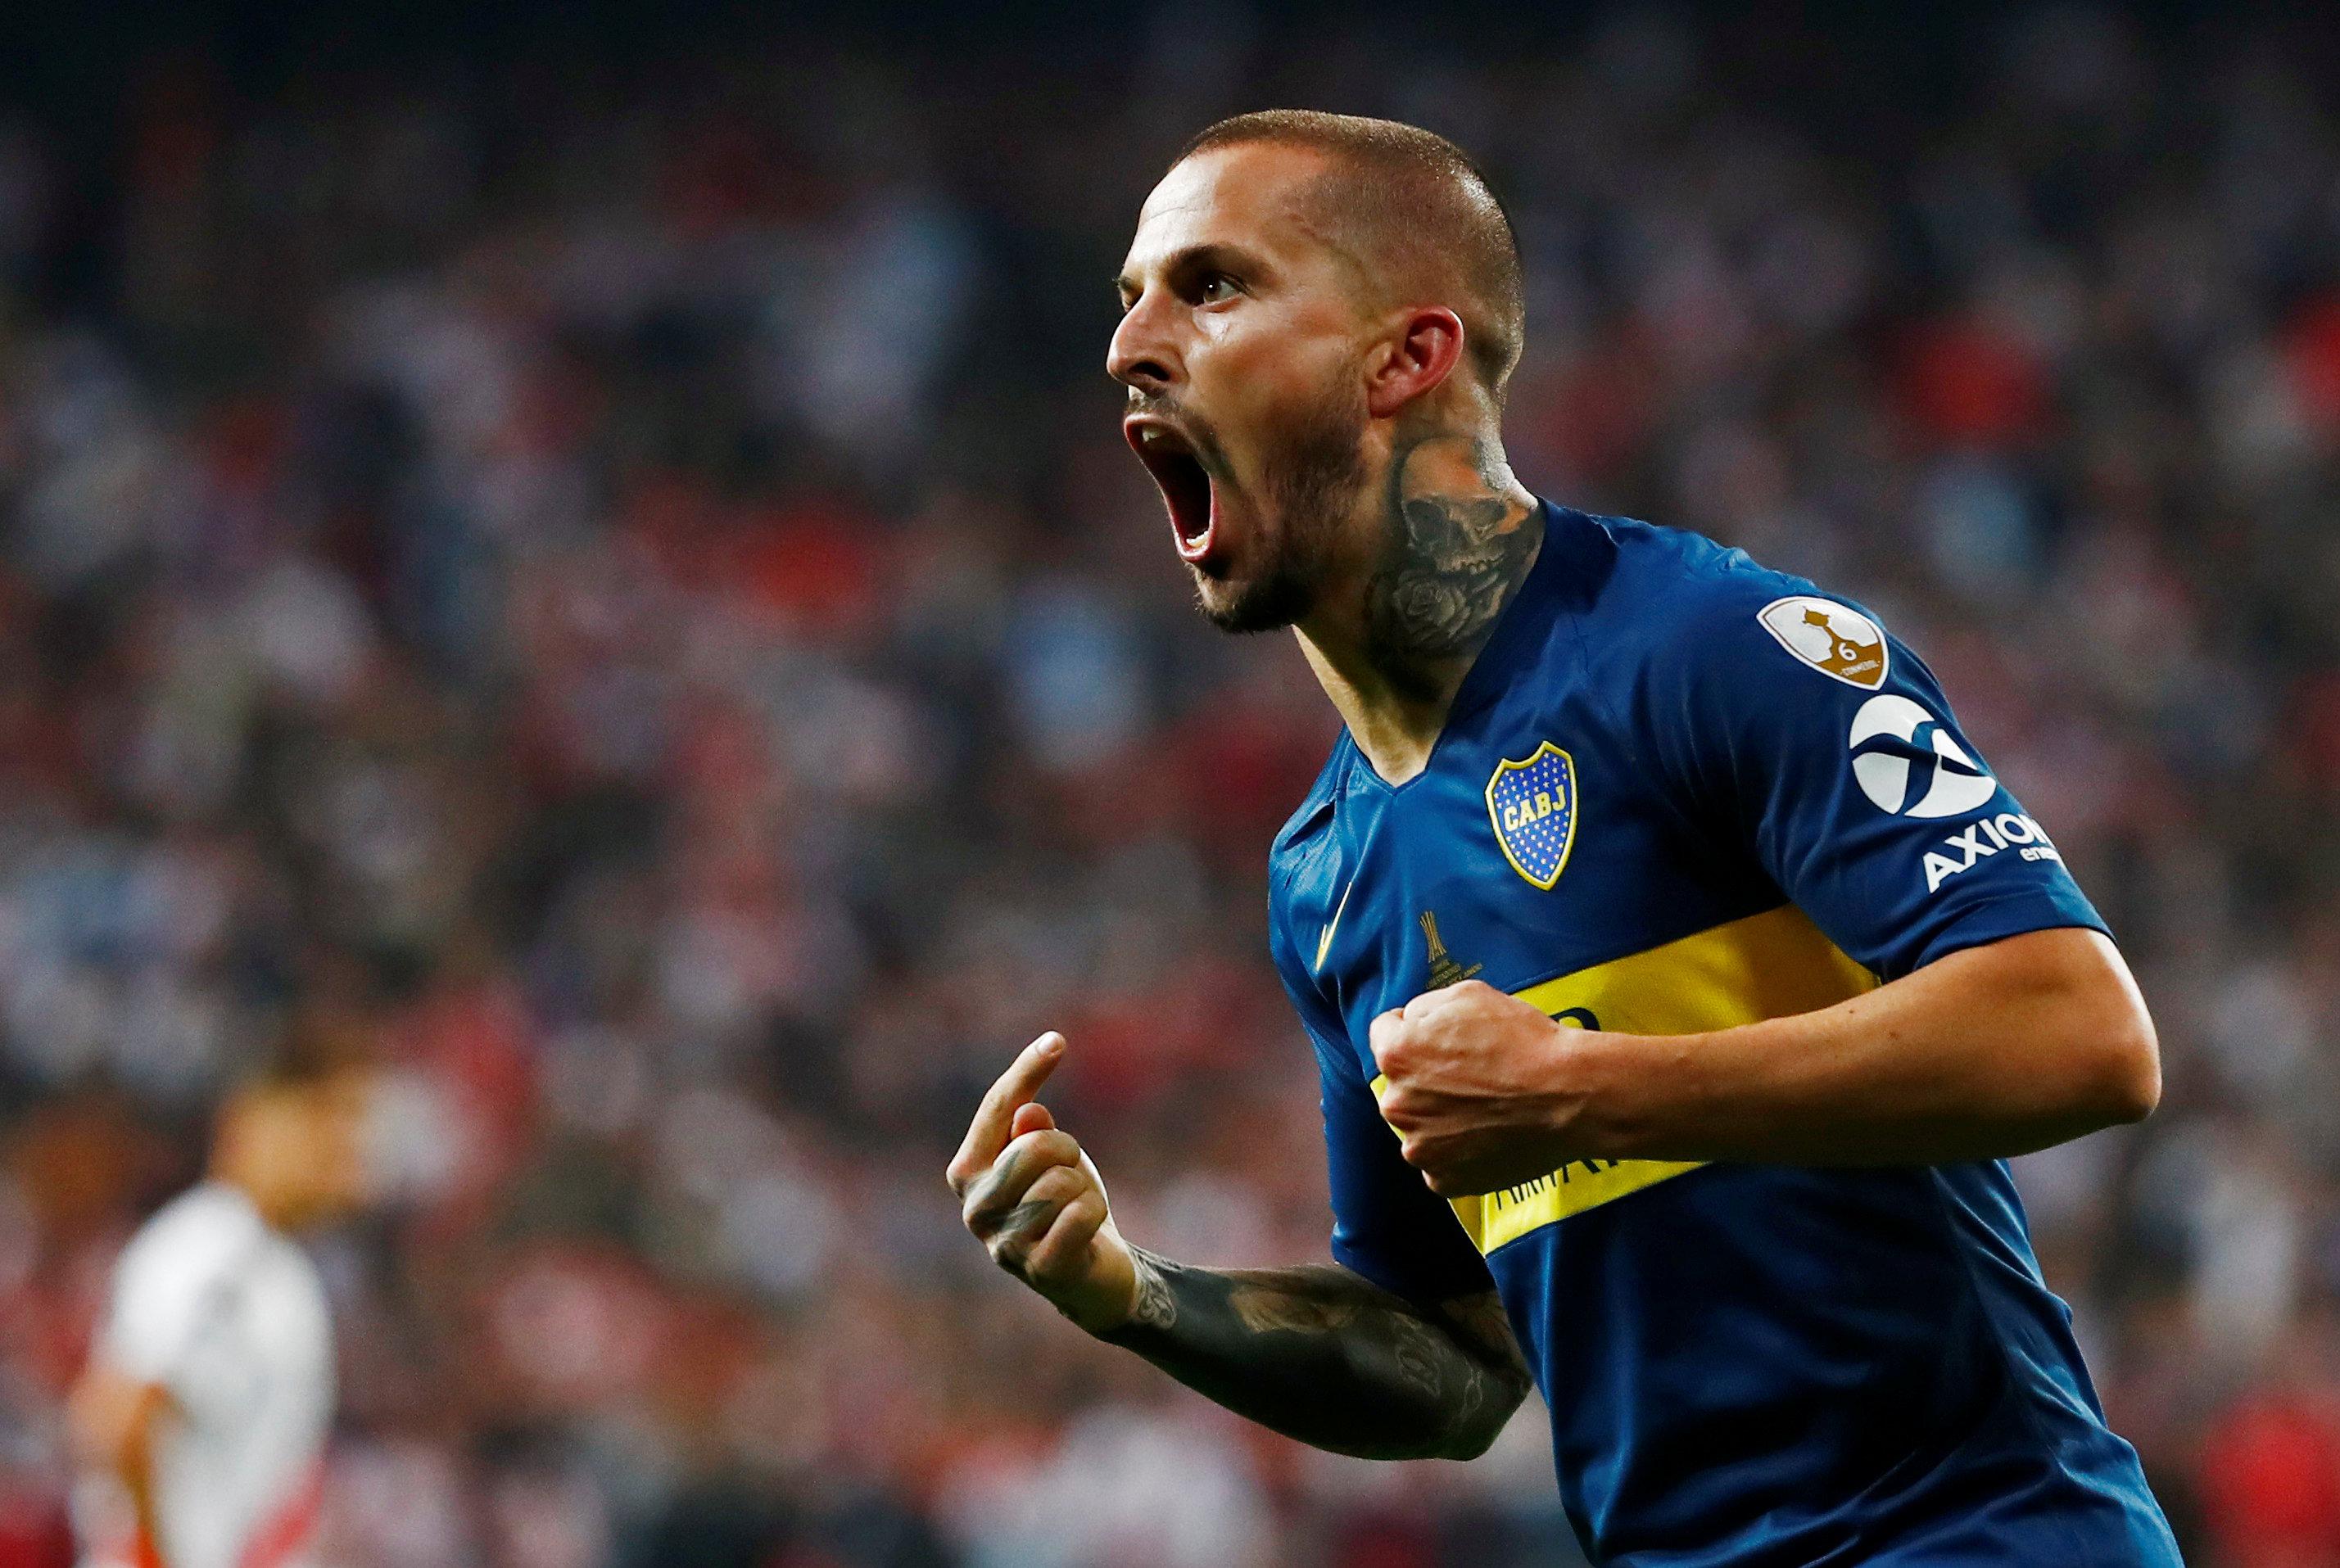 Football - Transferts - 16 millions d'euros pour Dario Benedetto : Marseille tente-il un pari fou ?